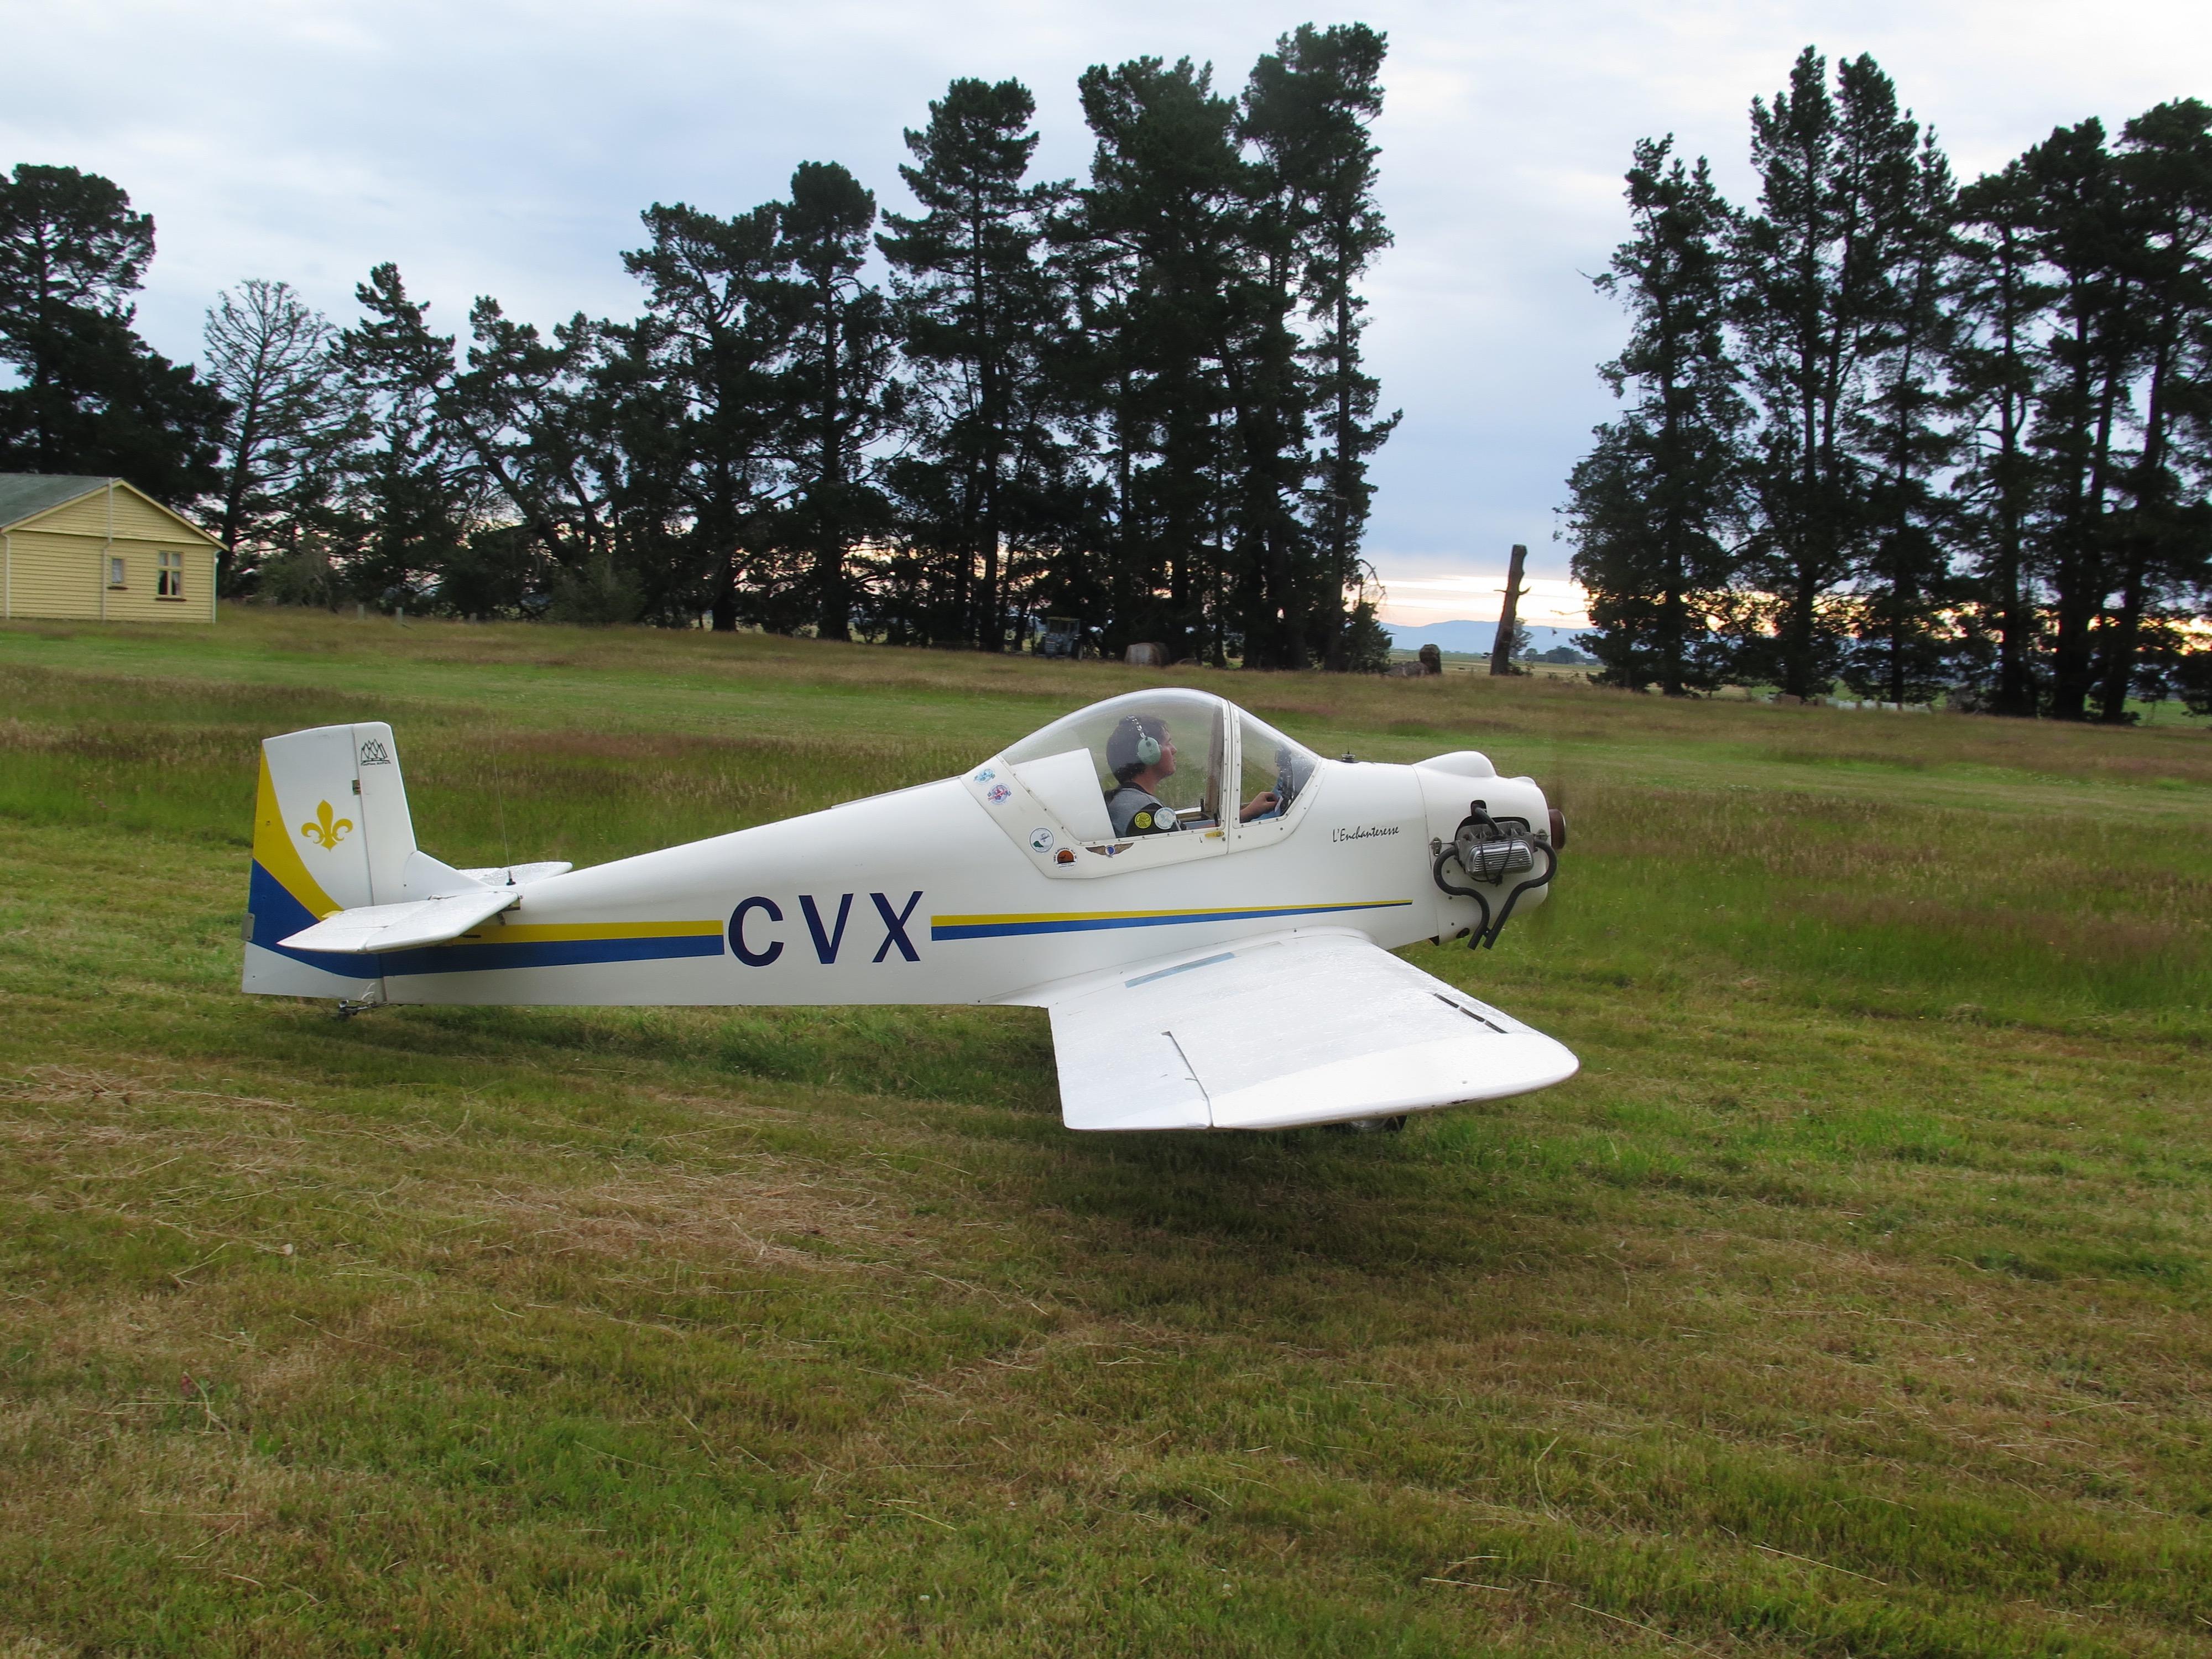 #15 Druine Turbulent ZK-CVX